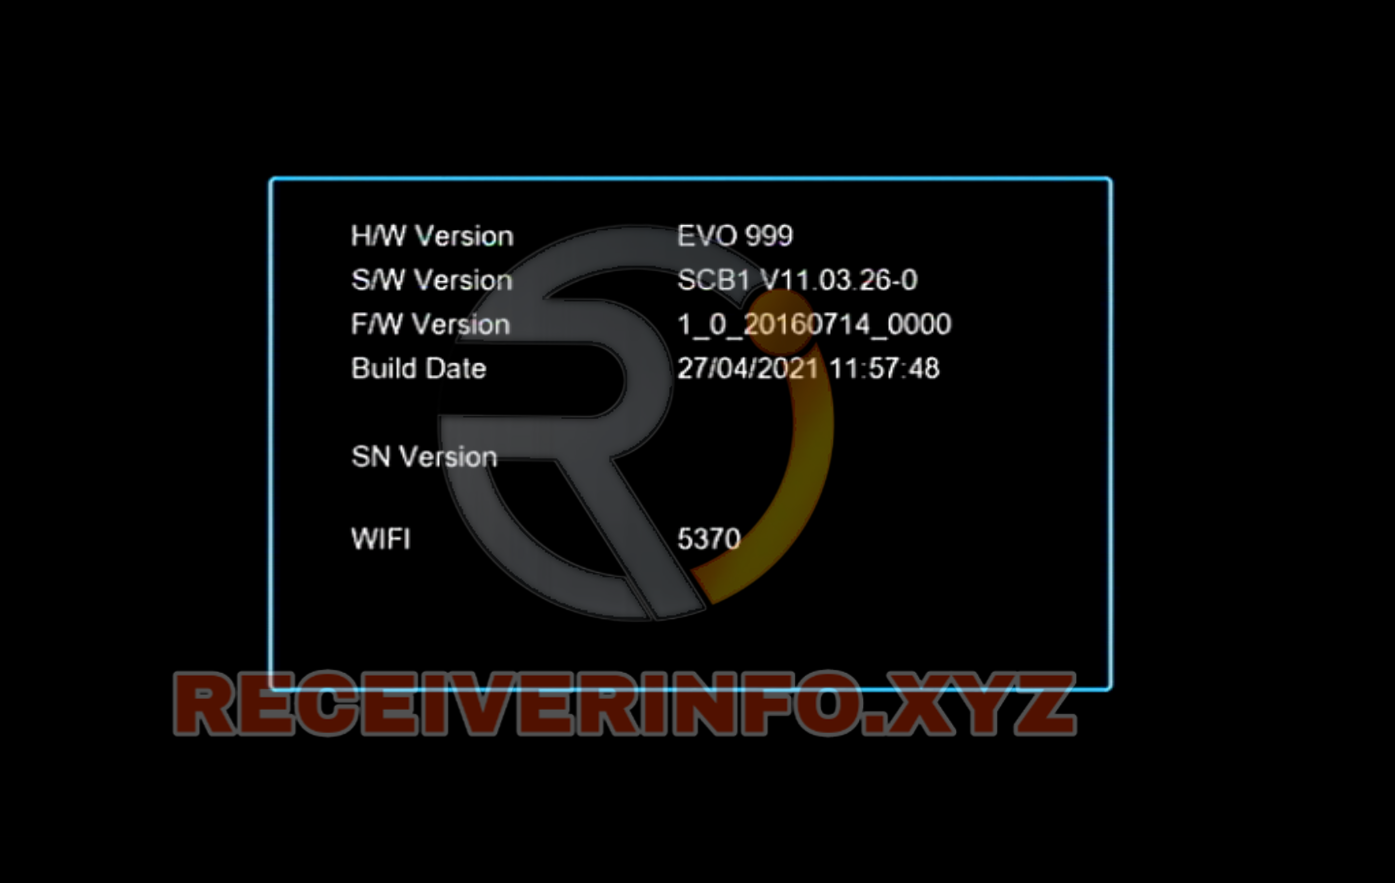 1506TV EVO 999 RECEIVER NEW SOFTWARE V11.03.26 UPDATE